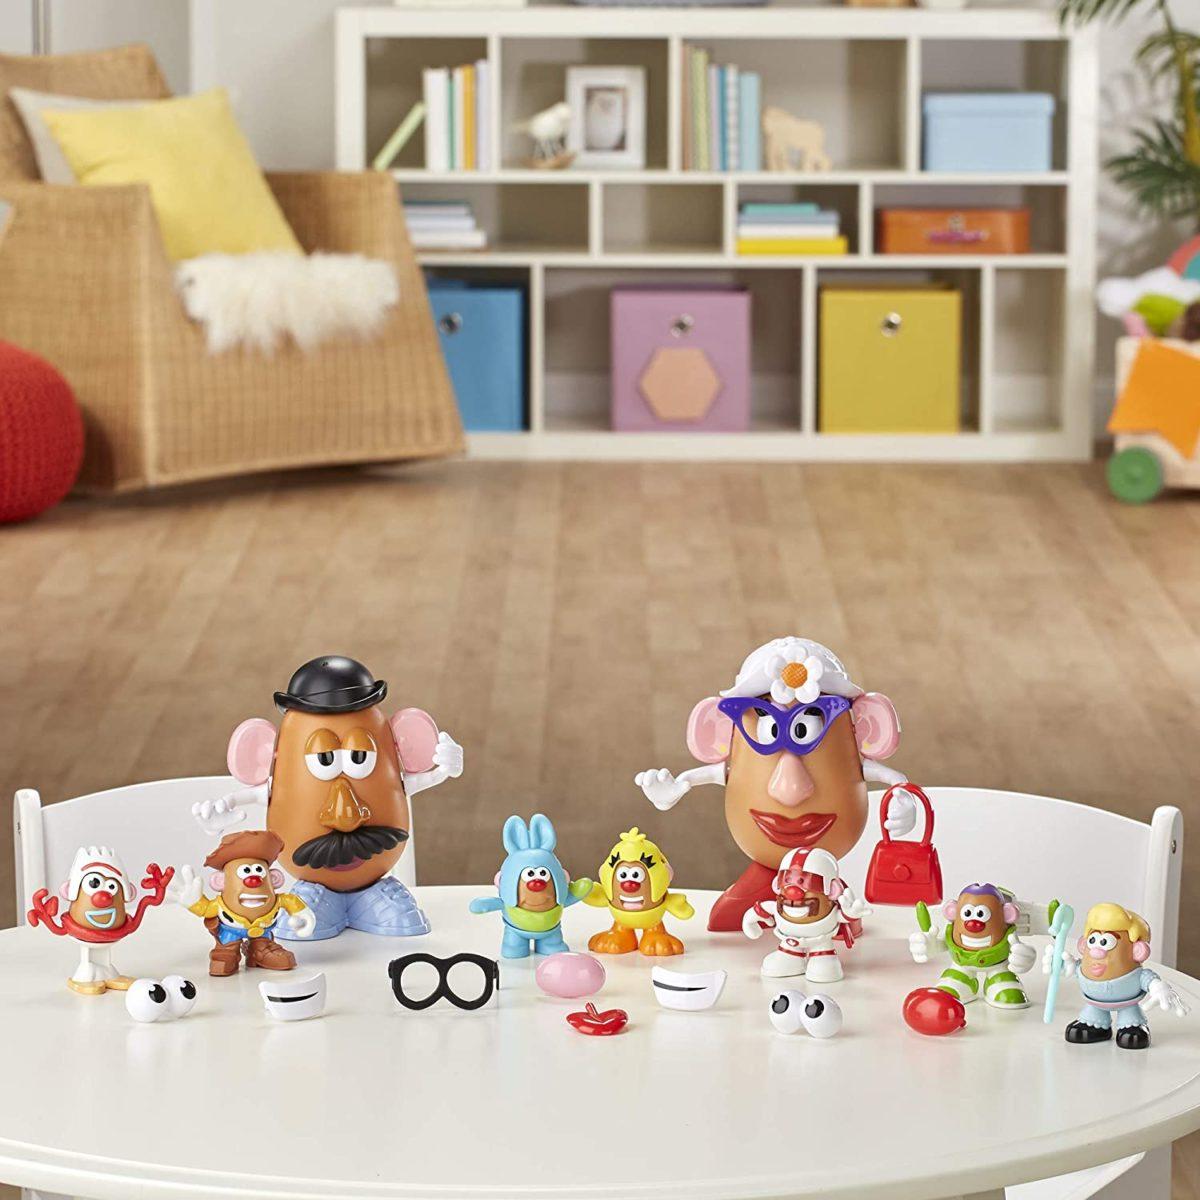 mr. potato head disney/pixar toy story 4 andy's playroom potato pack - amazon